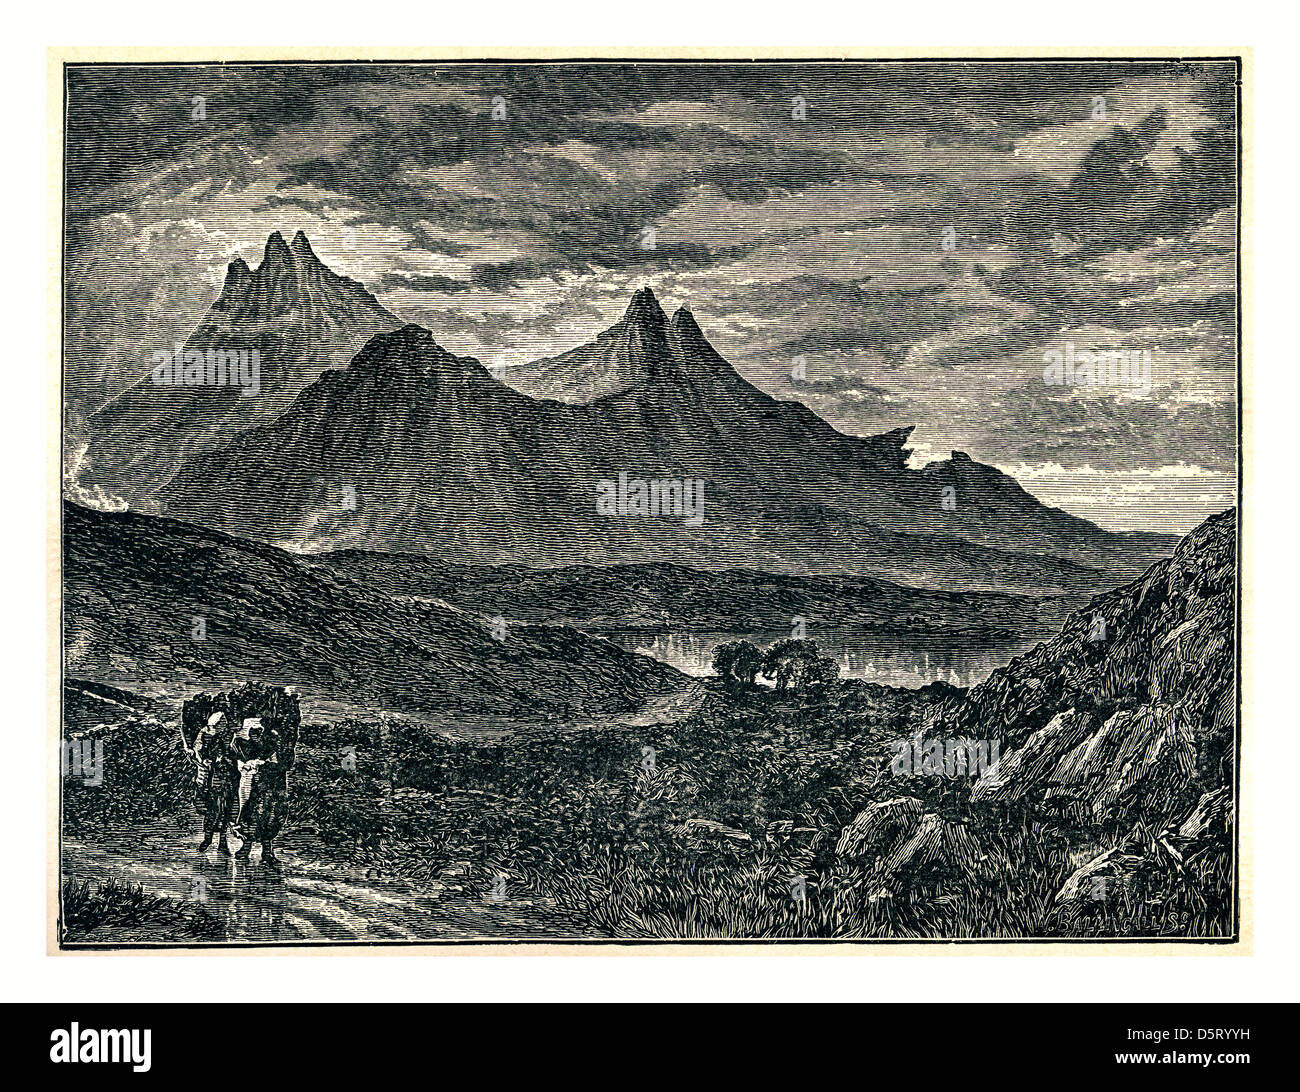 Historische Abbildung 1700 The Pinnacles, Scuir-Na-Gillian, Isle Of Skye Stockbild